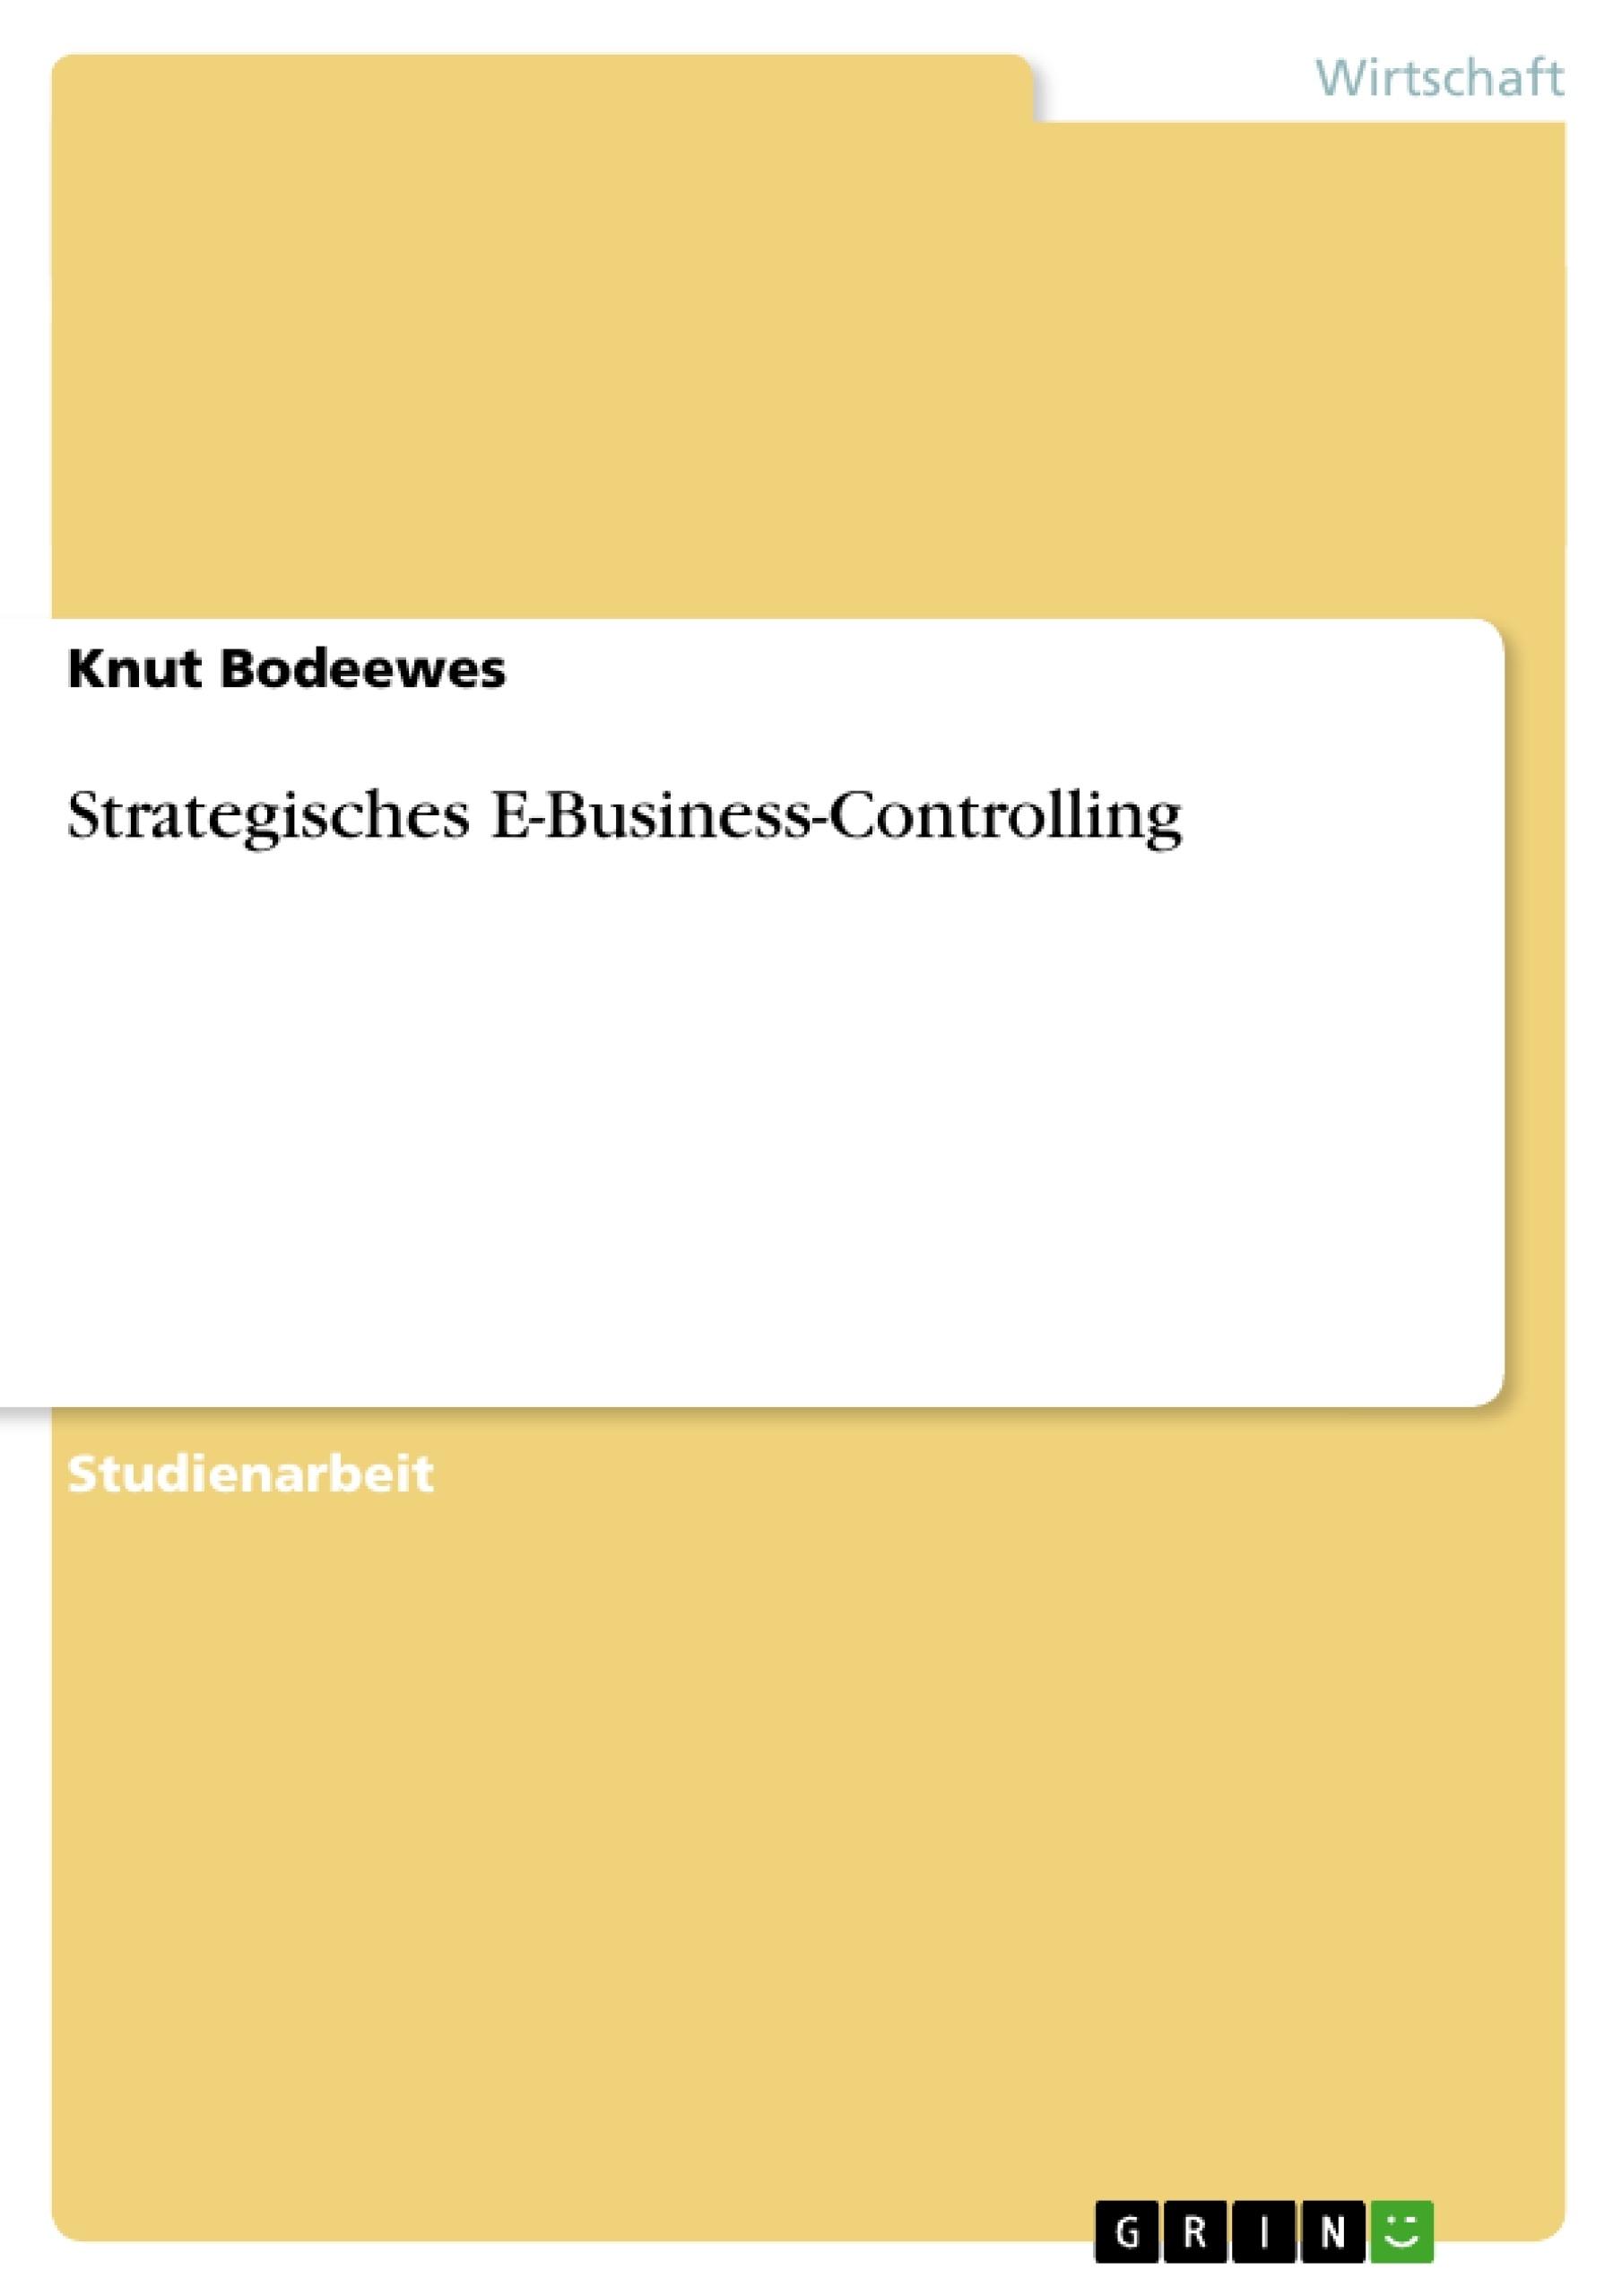 Titel: Strategisches E-Business-Controlling